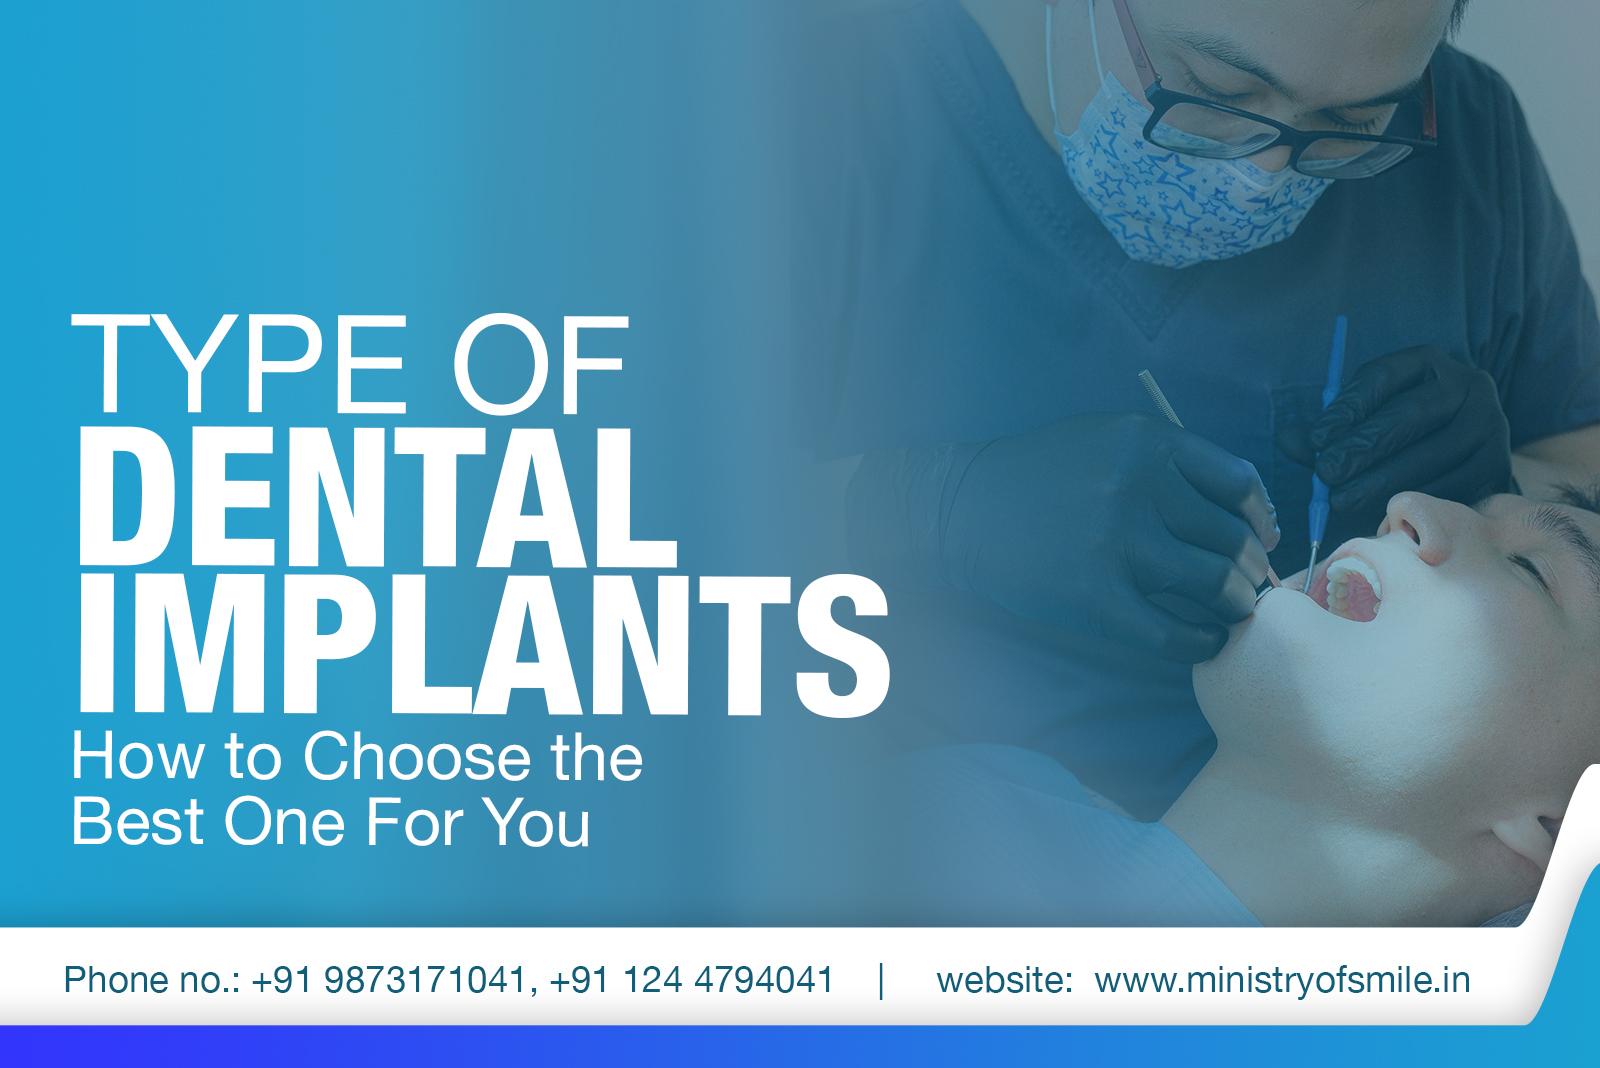 Type of Dental Implants